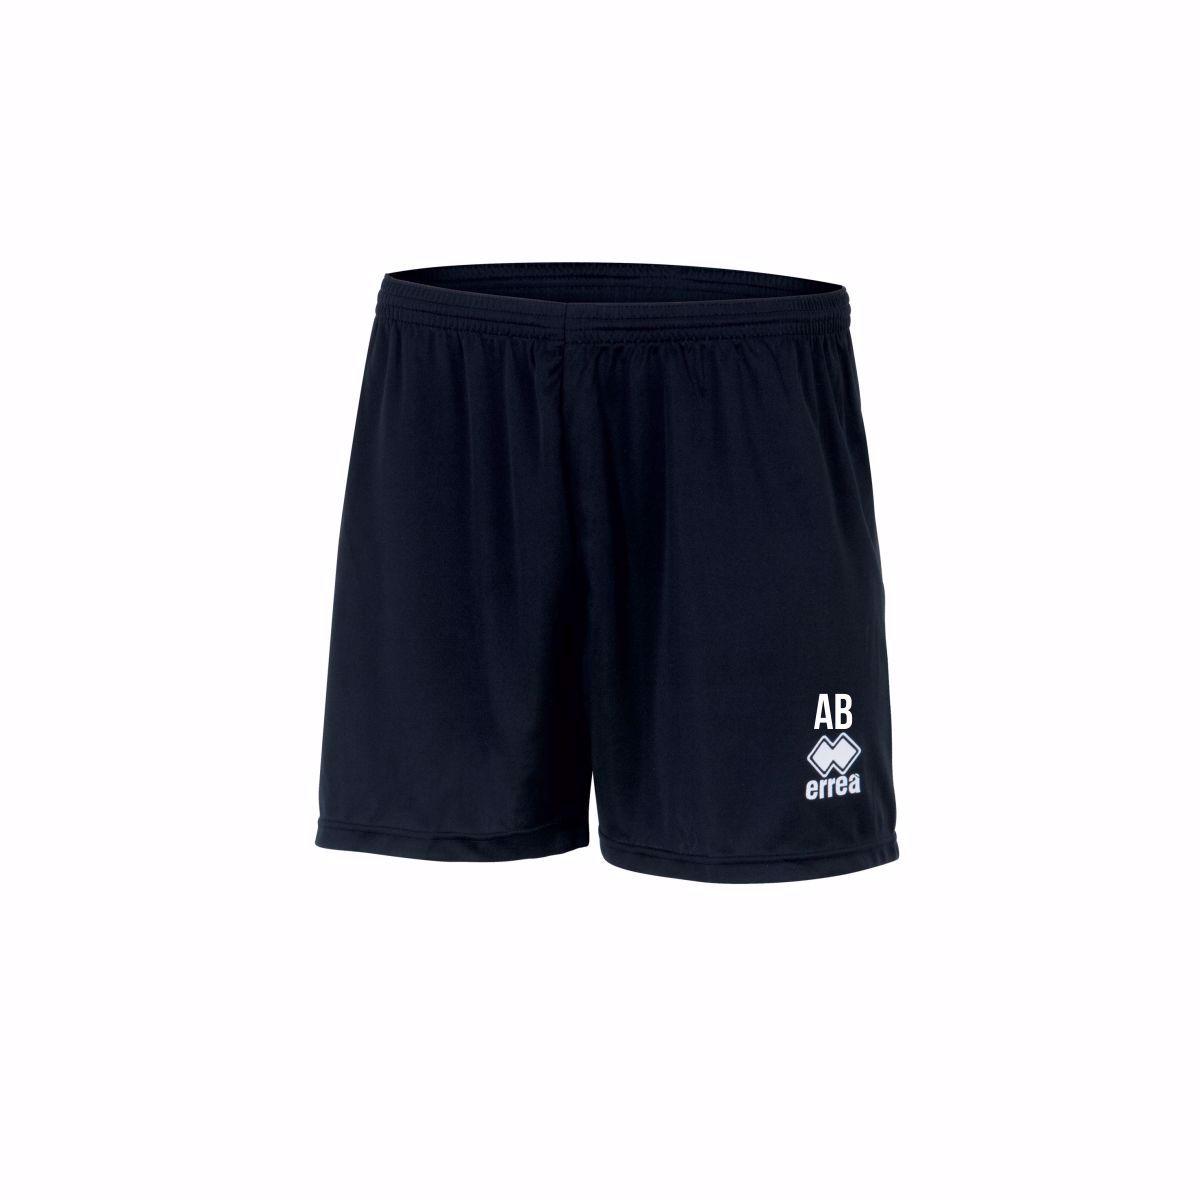 BISHOPS LYDEARDS FC New Skin Training Shorts - Black Junior